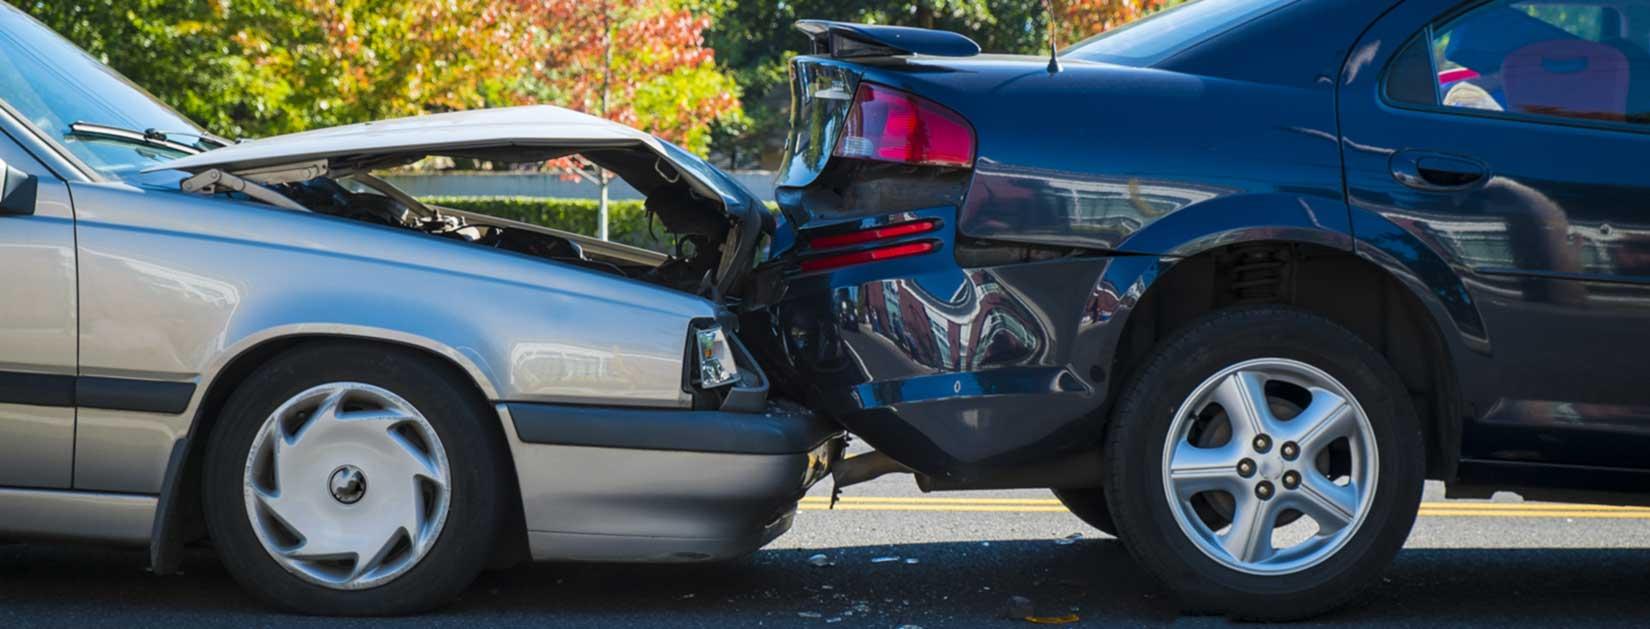 Gilbert car accident lawyer